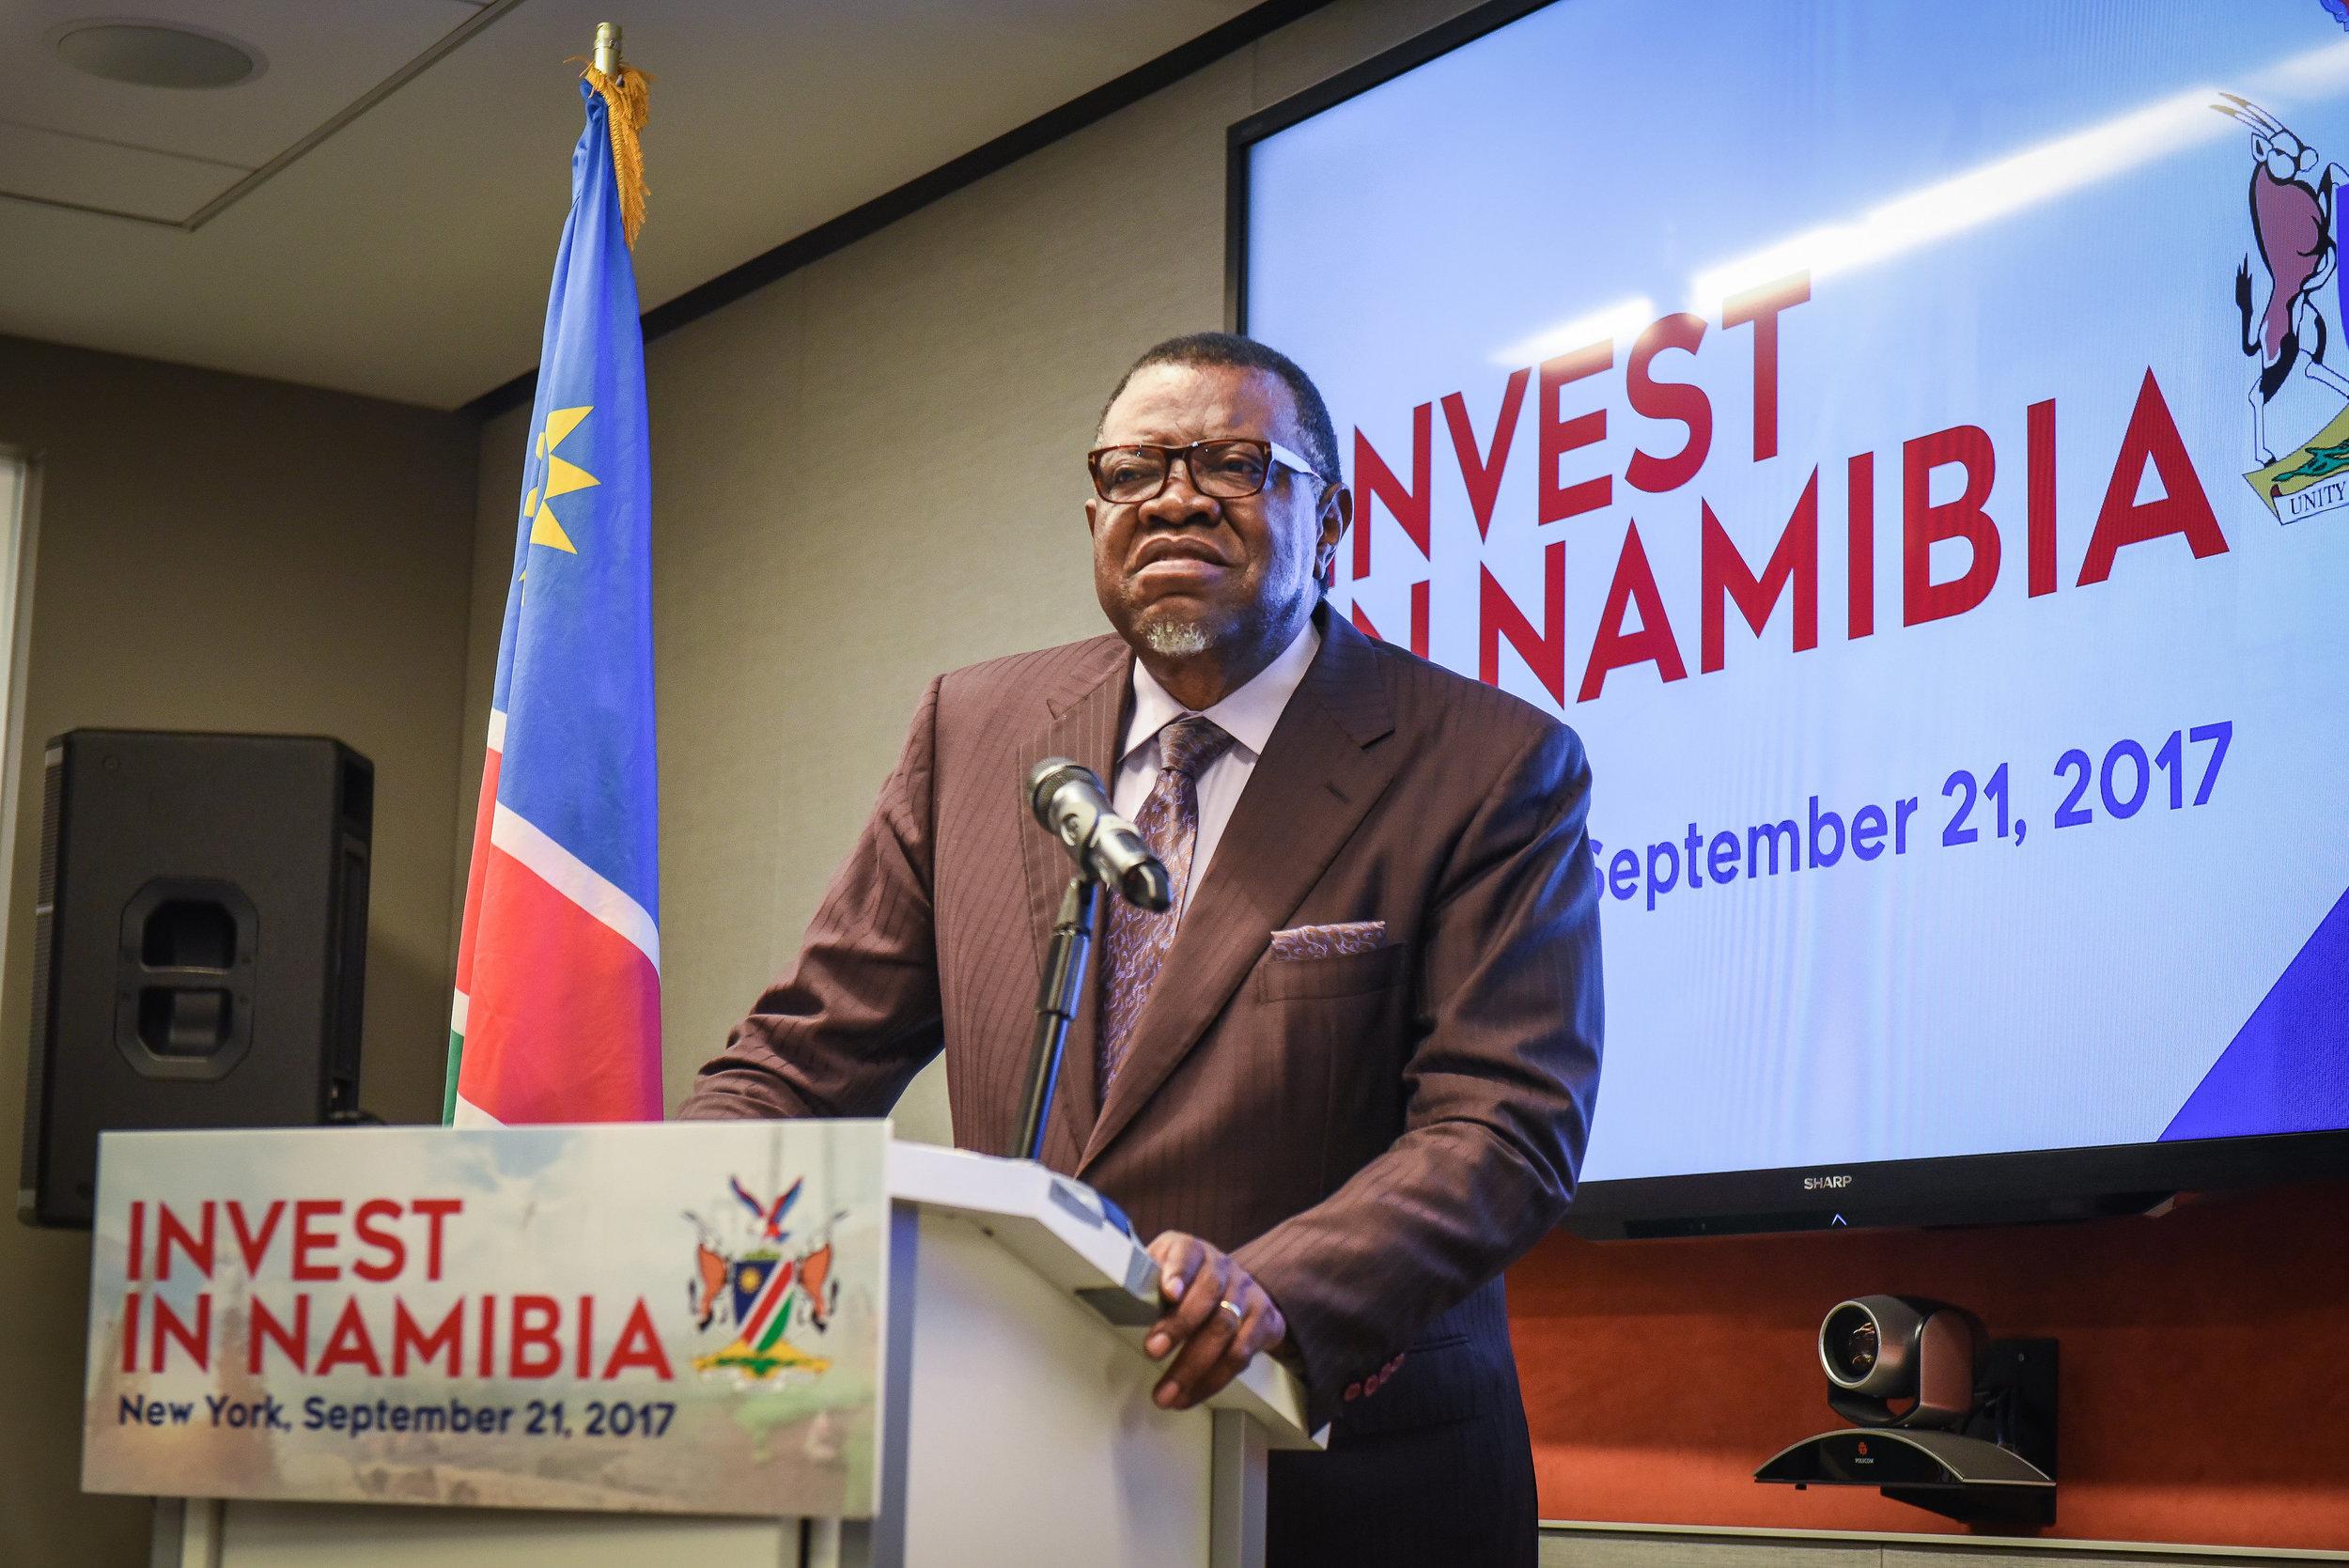 Invest in Namibia.jpg